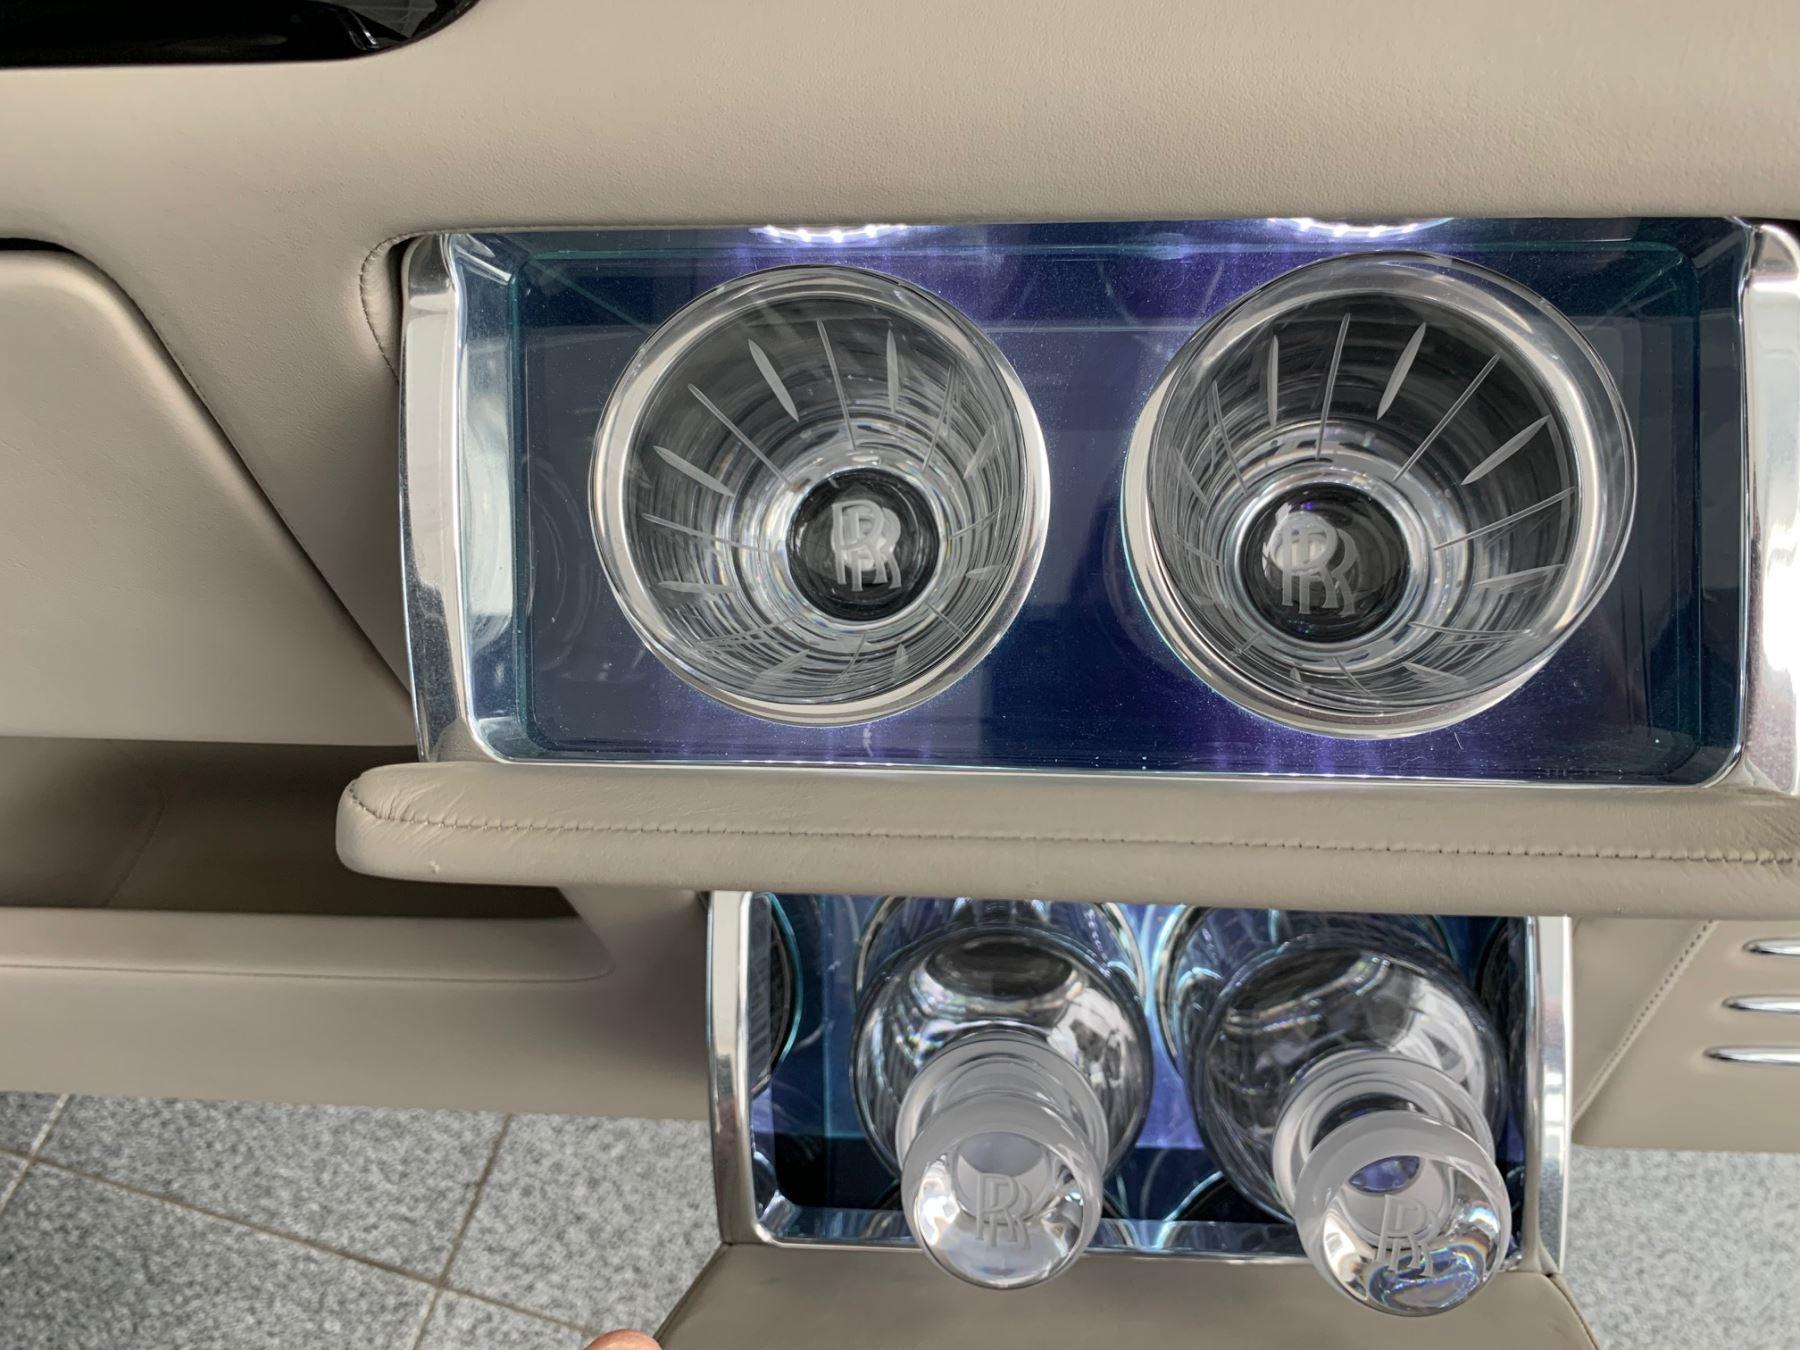 Rolls-Royce Phantom Extended Wheelbase II 4dr Auto Extended Wheel Base image 15